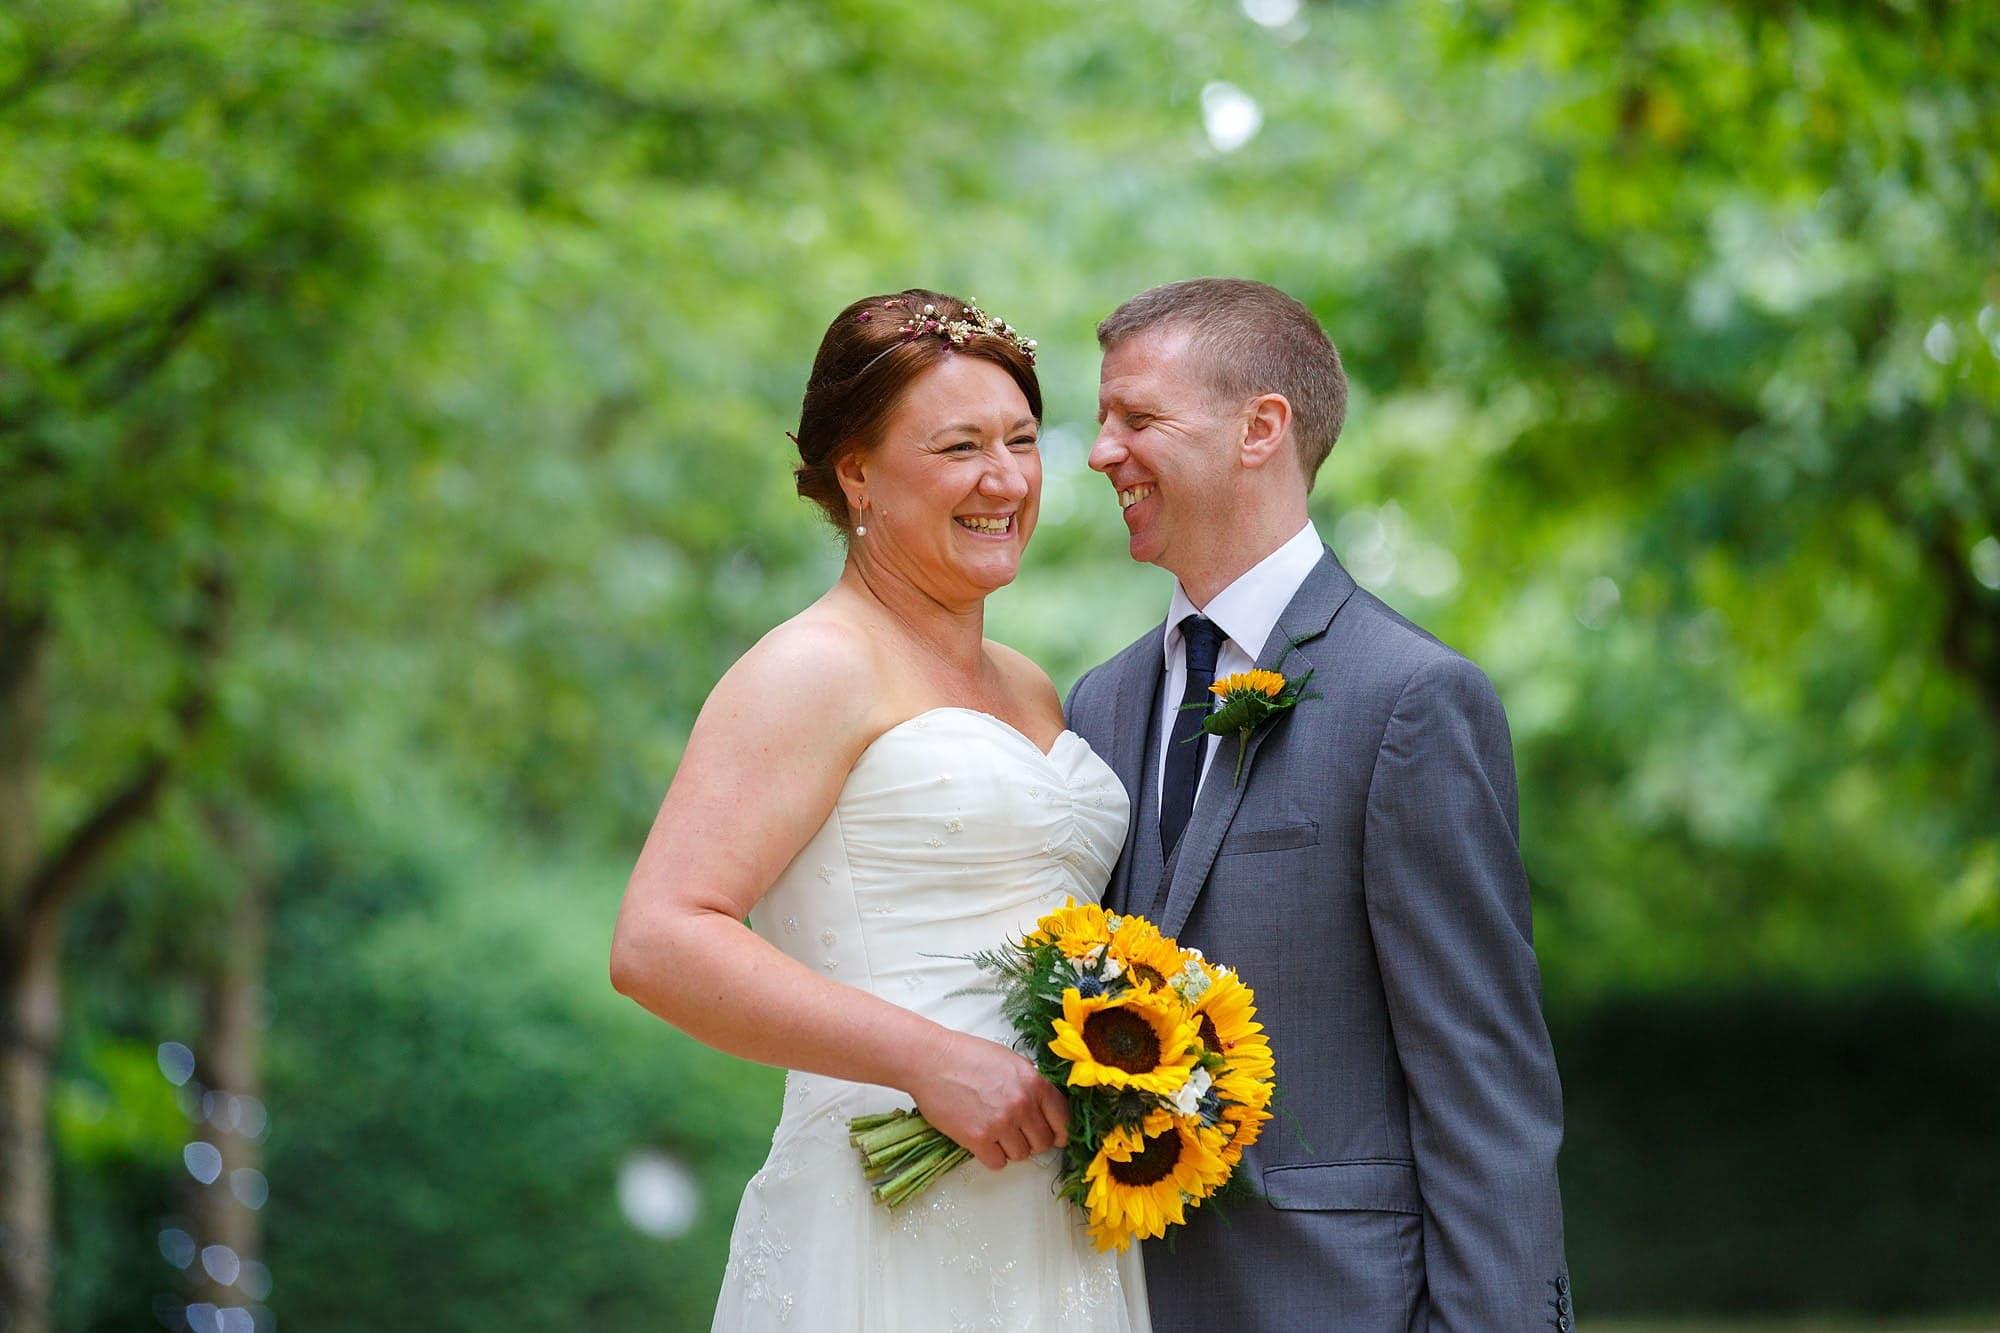 Sunflower wedding at South Farm